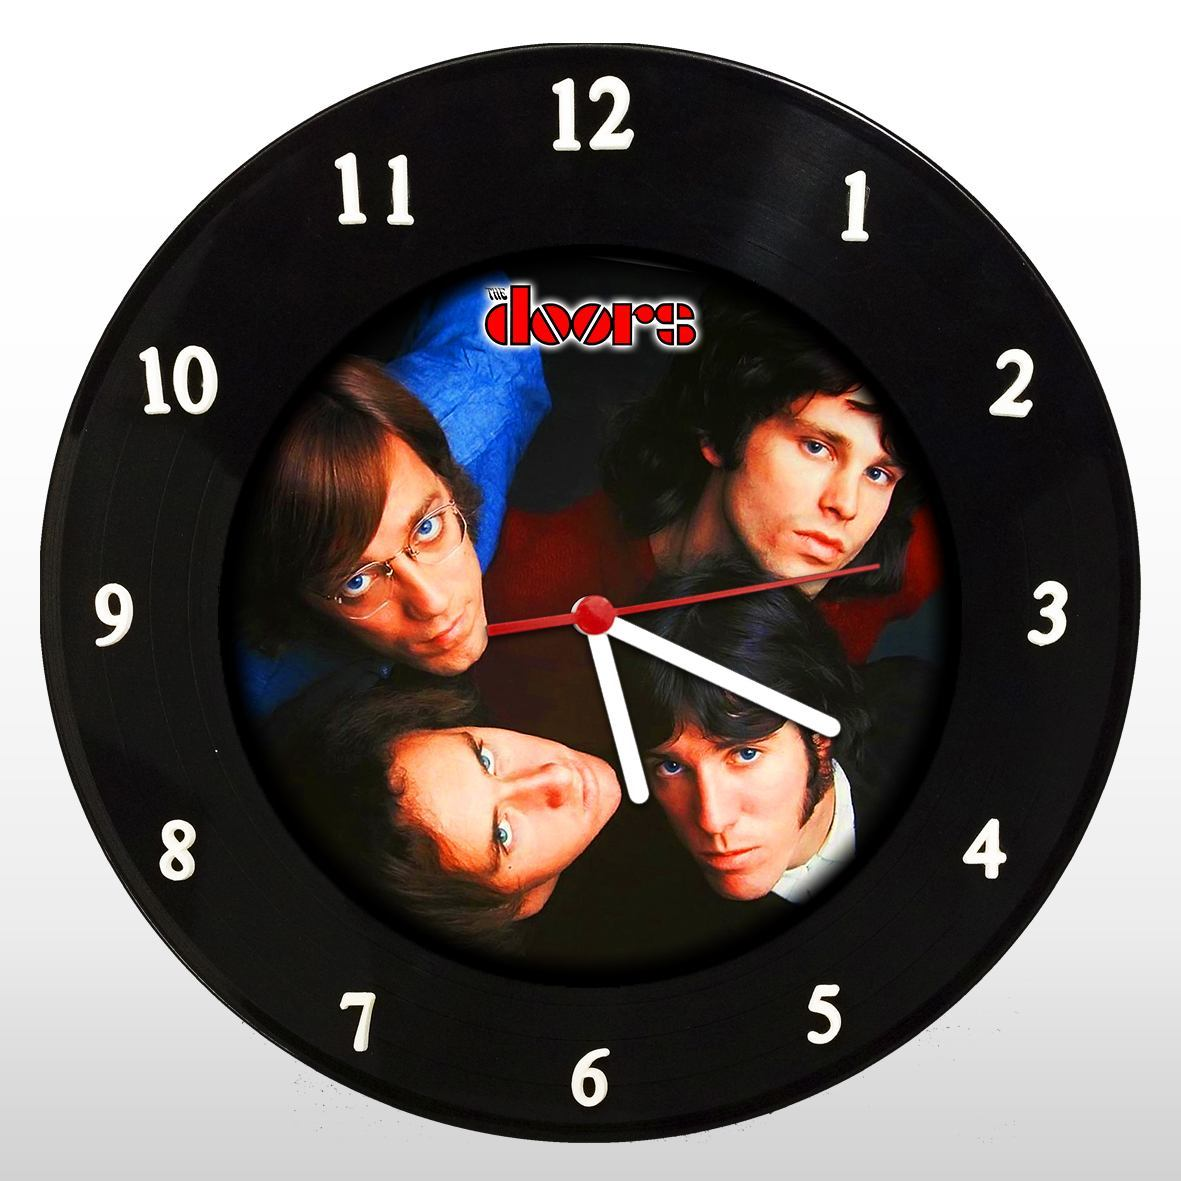 The Doors - Relógio de Parede em Disco de Vinil - Mr. Rock